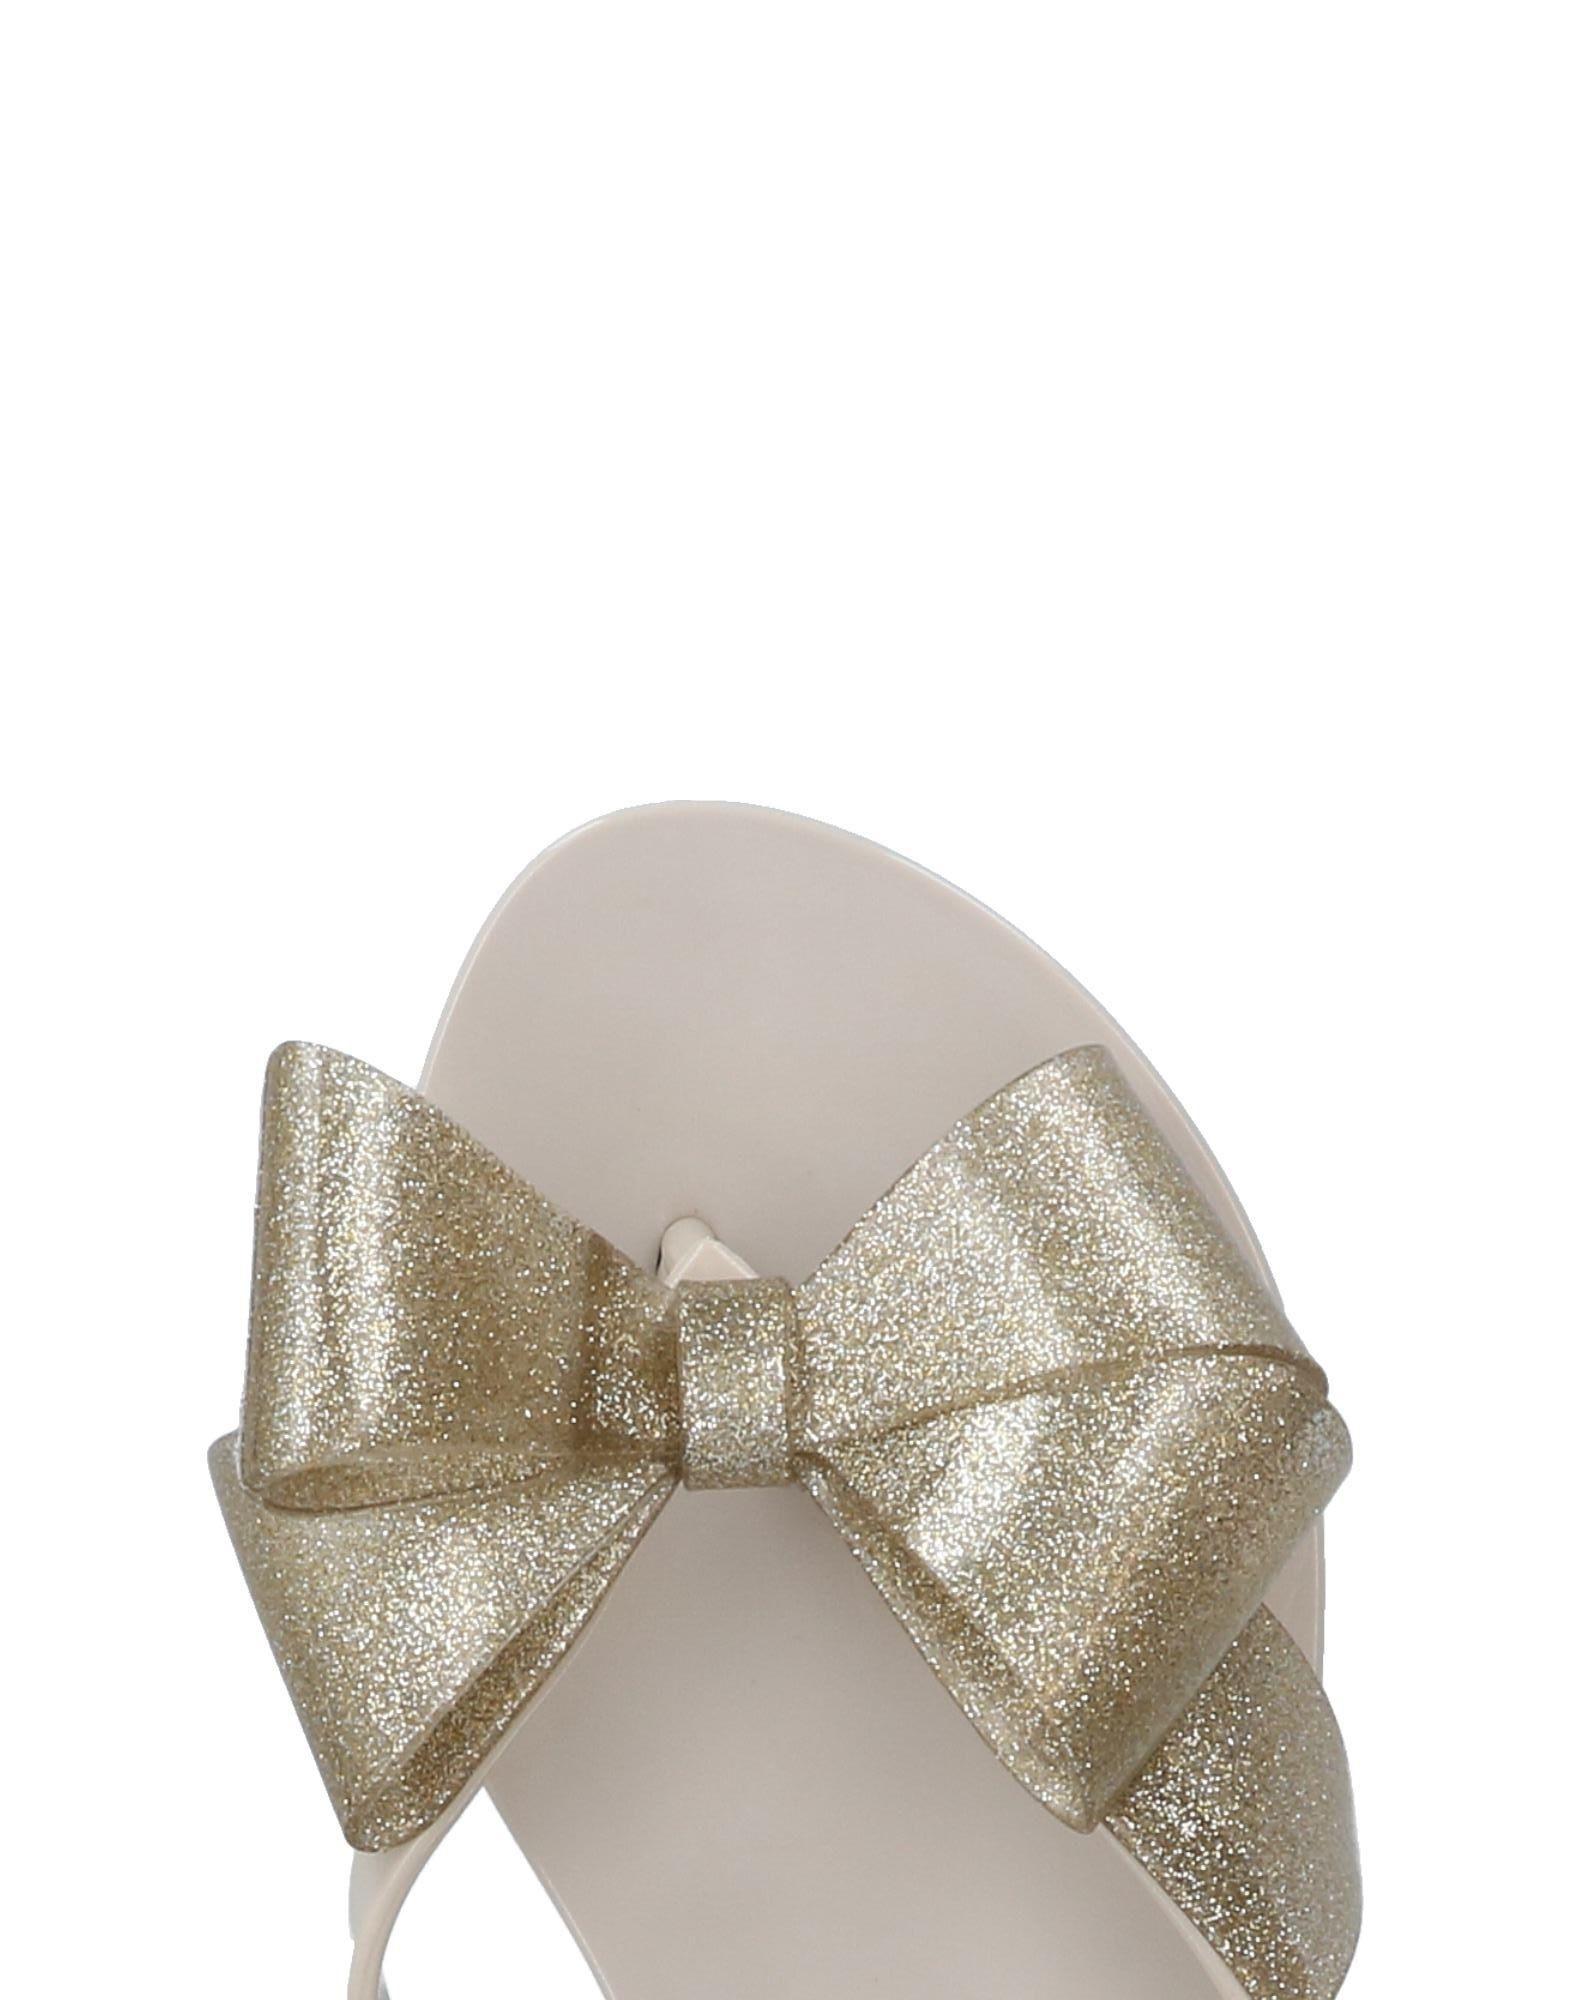 Melissa Dianetten Damen beliebte  11353299OR Gute Qualität beliebte Damen Schuhe 266187